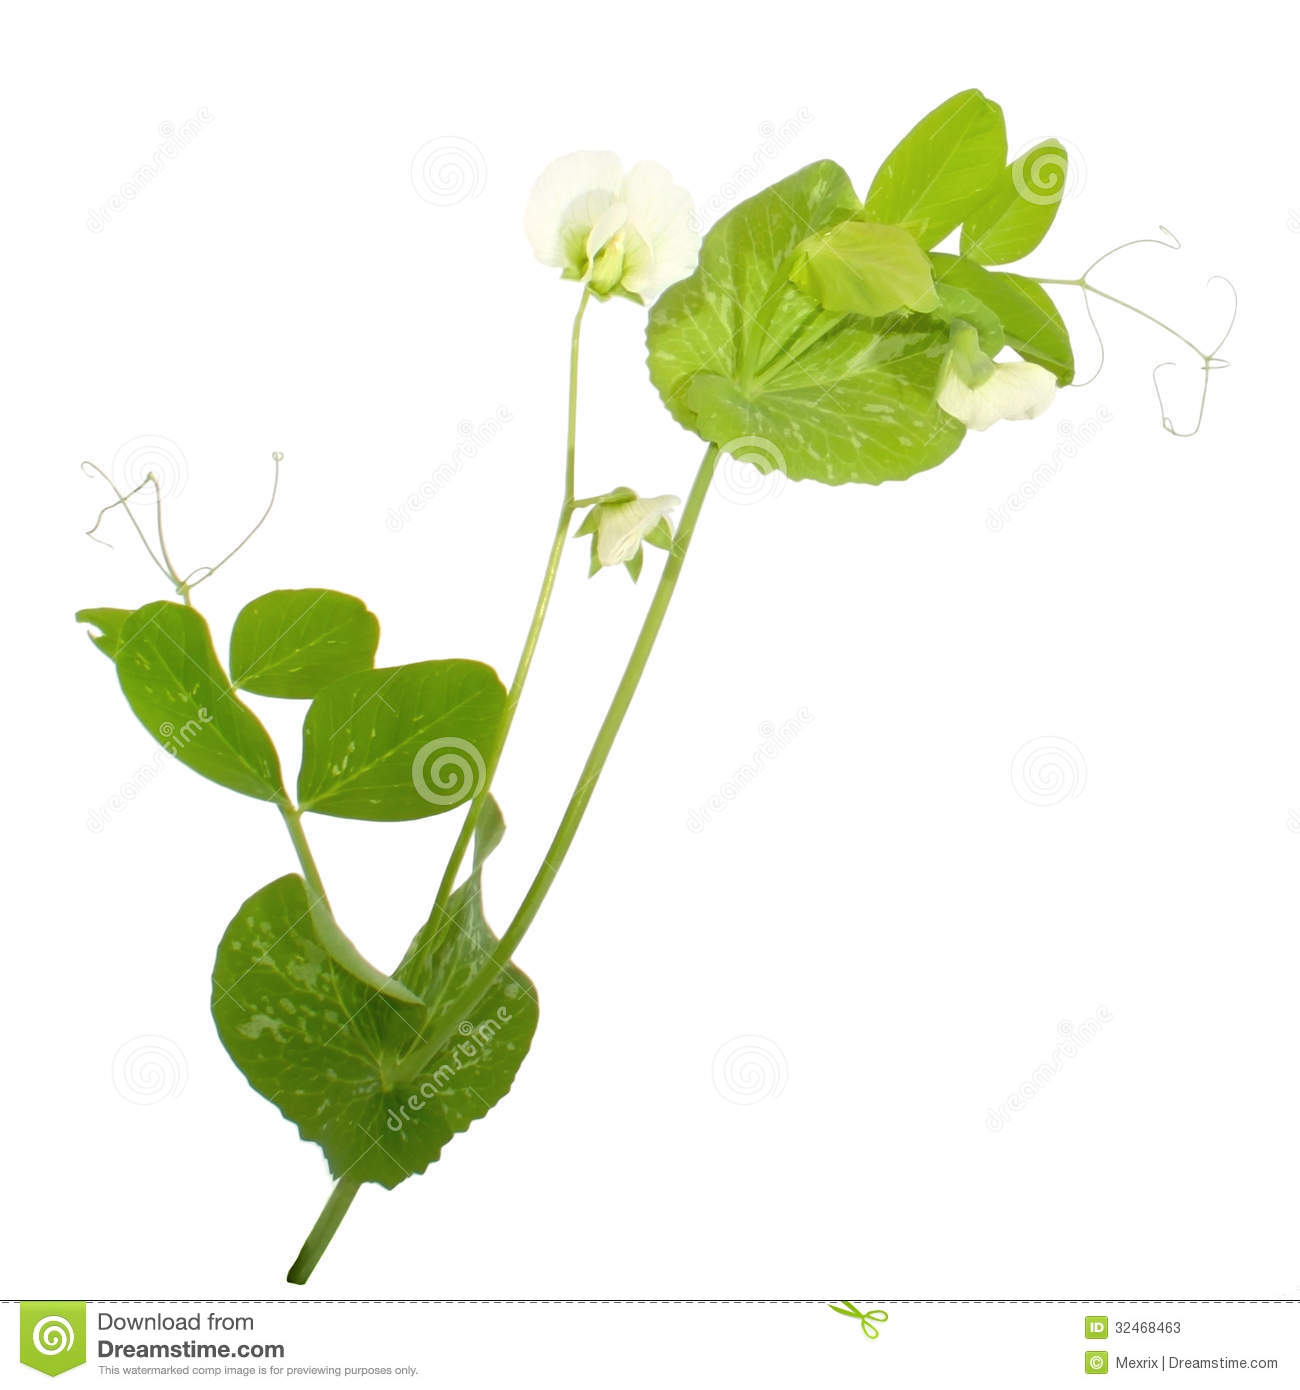 Peas Plant Stock Photos.